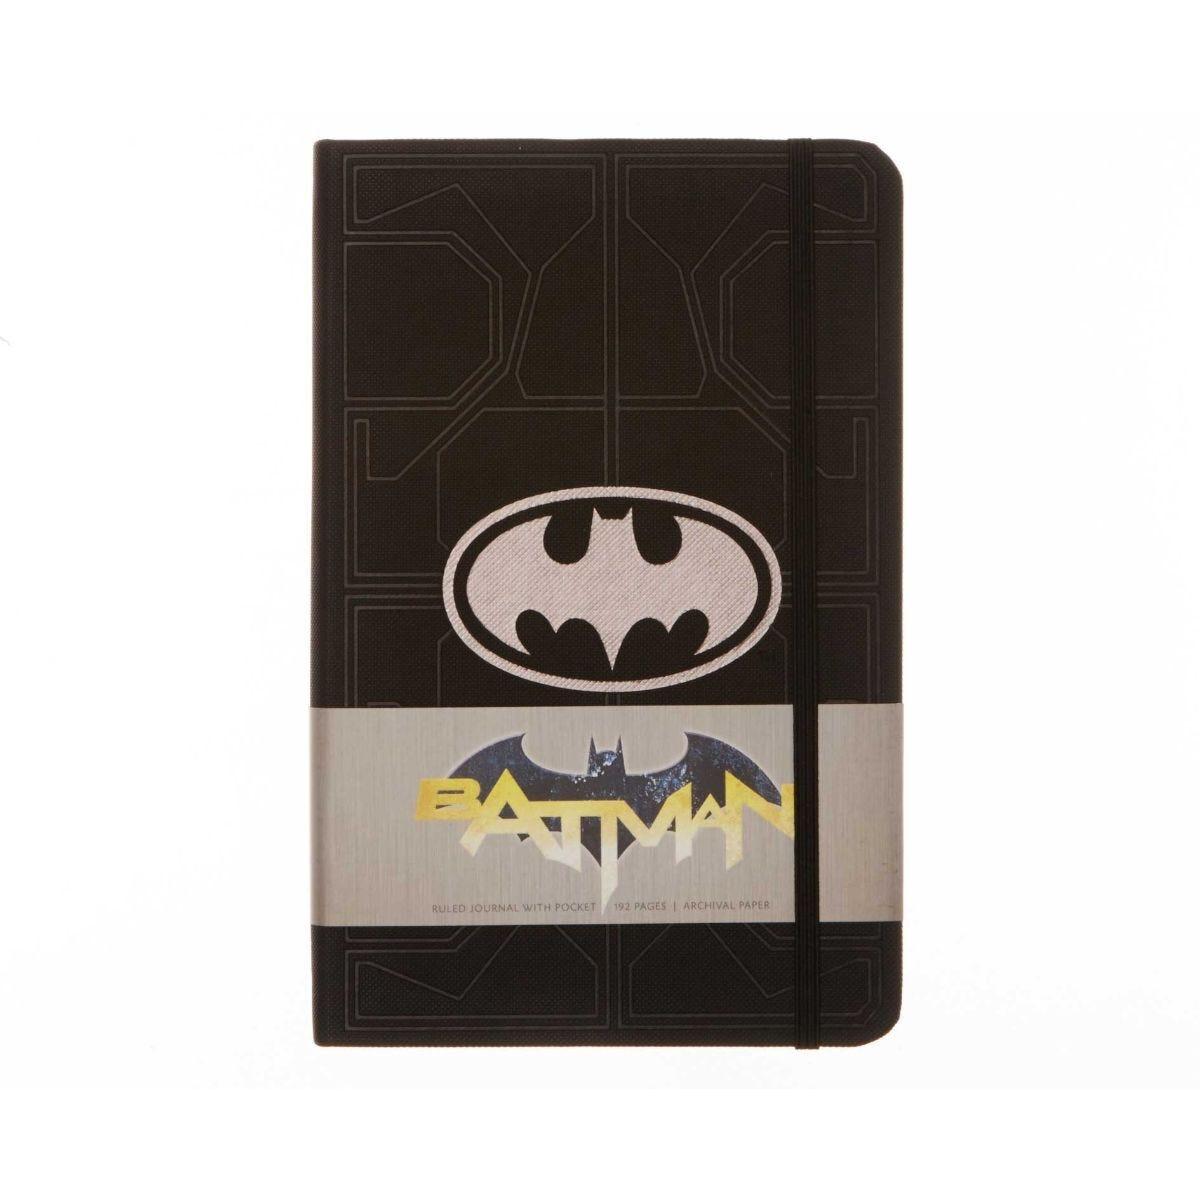 Batman Ruled Journal